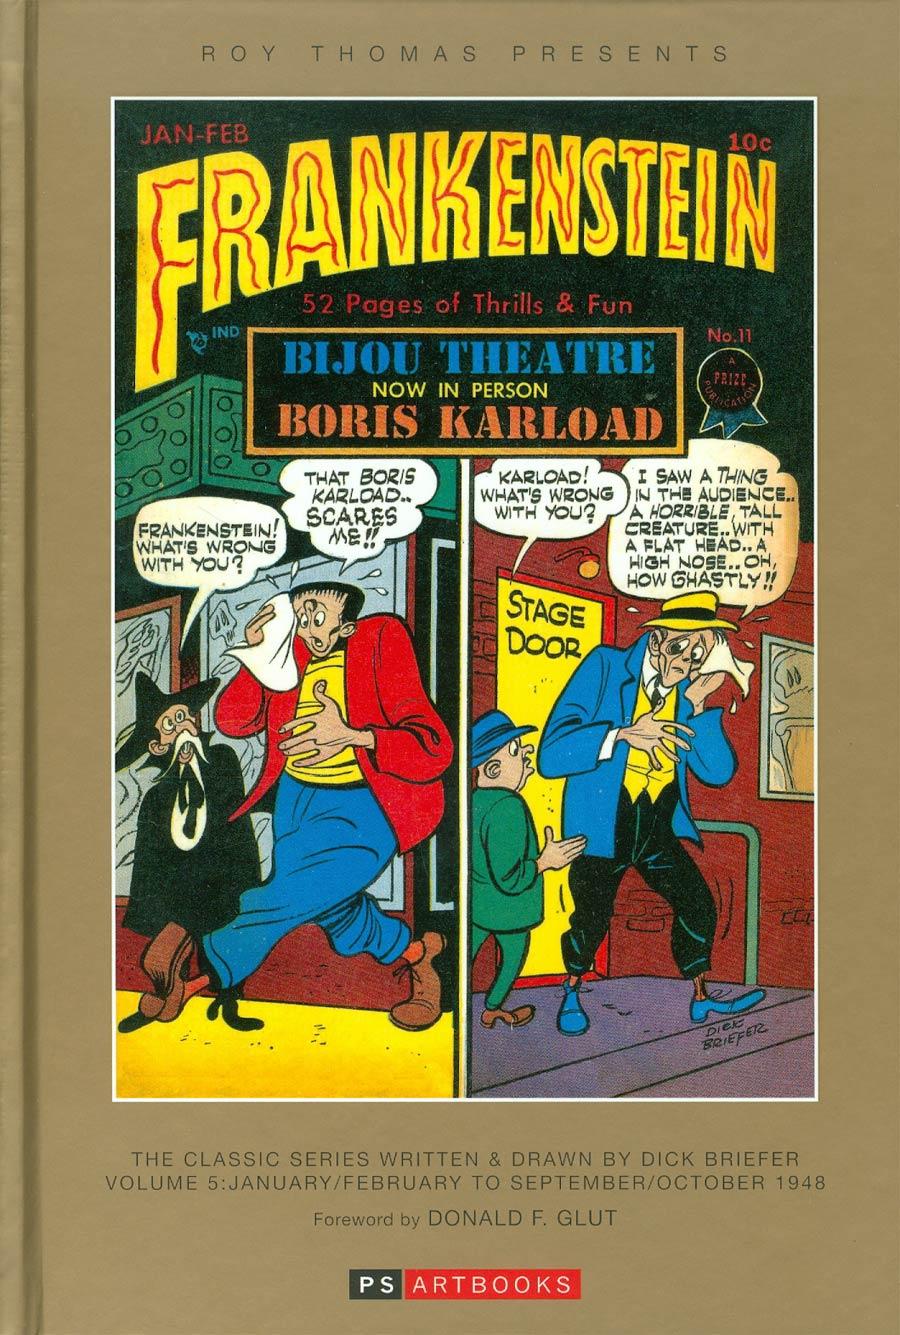 Roy Thomas Presents Dick Briefers Frankenstein Vol 5 1948 HC